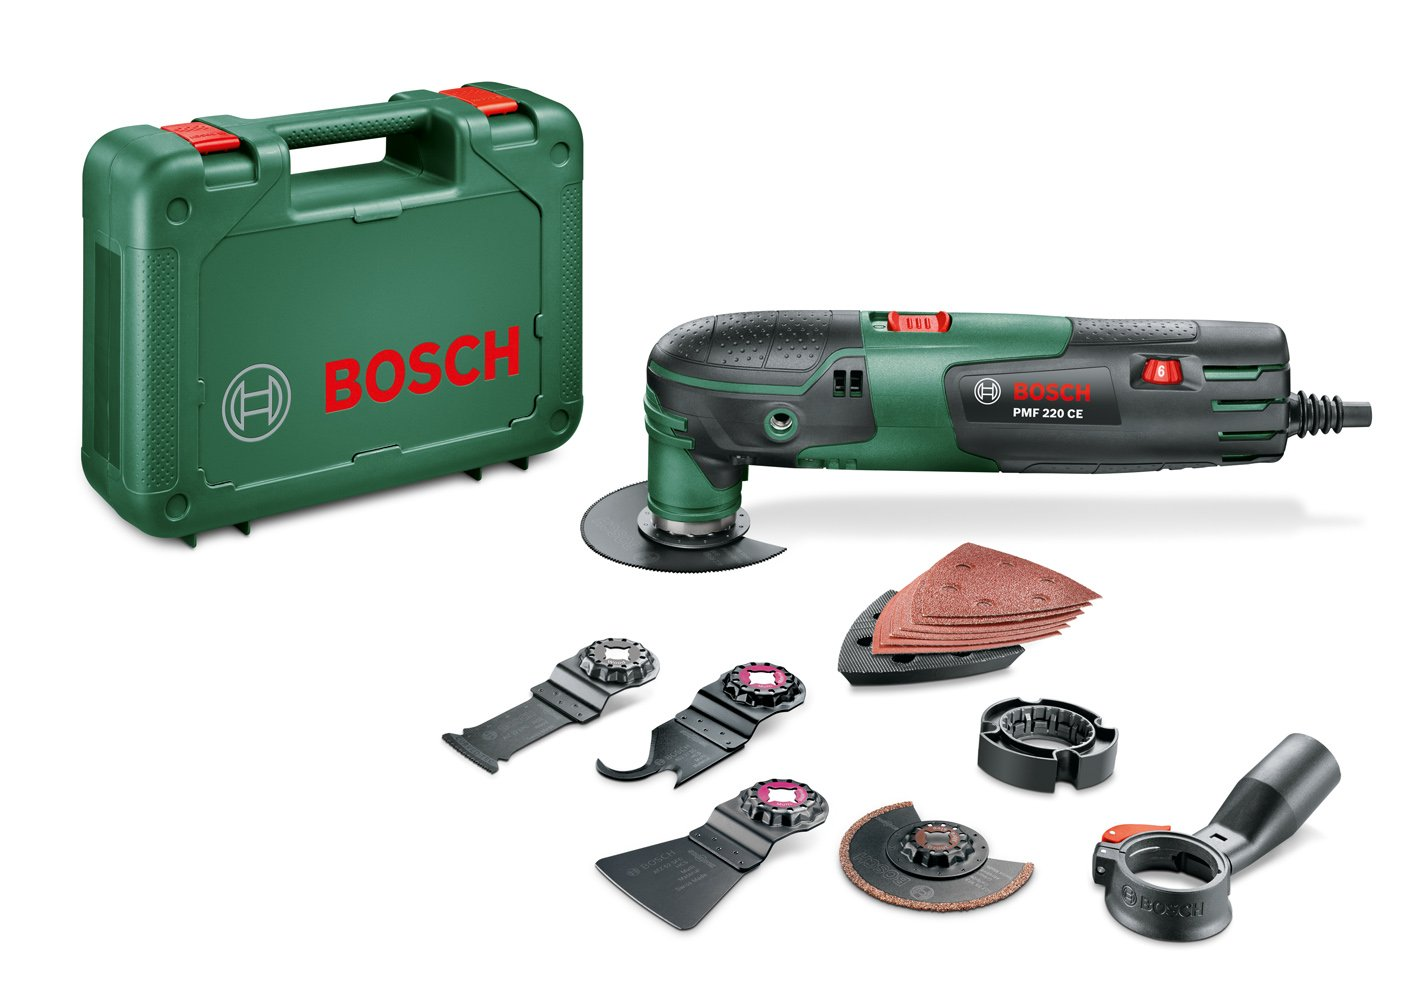 Bosch 0.603.102.000 PMF 220 CE Multiherramienta, 220 V, Schwarz, Grü n, W Grün 0603102000